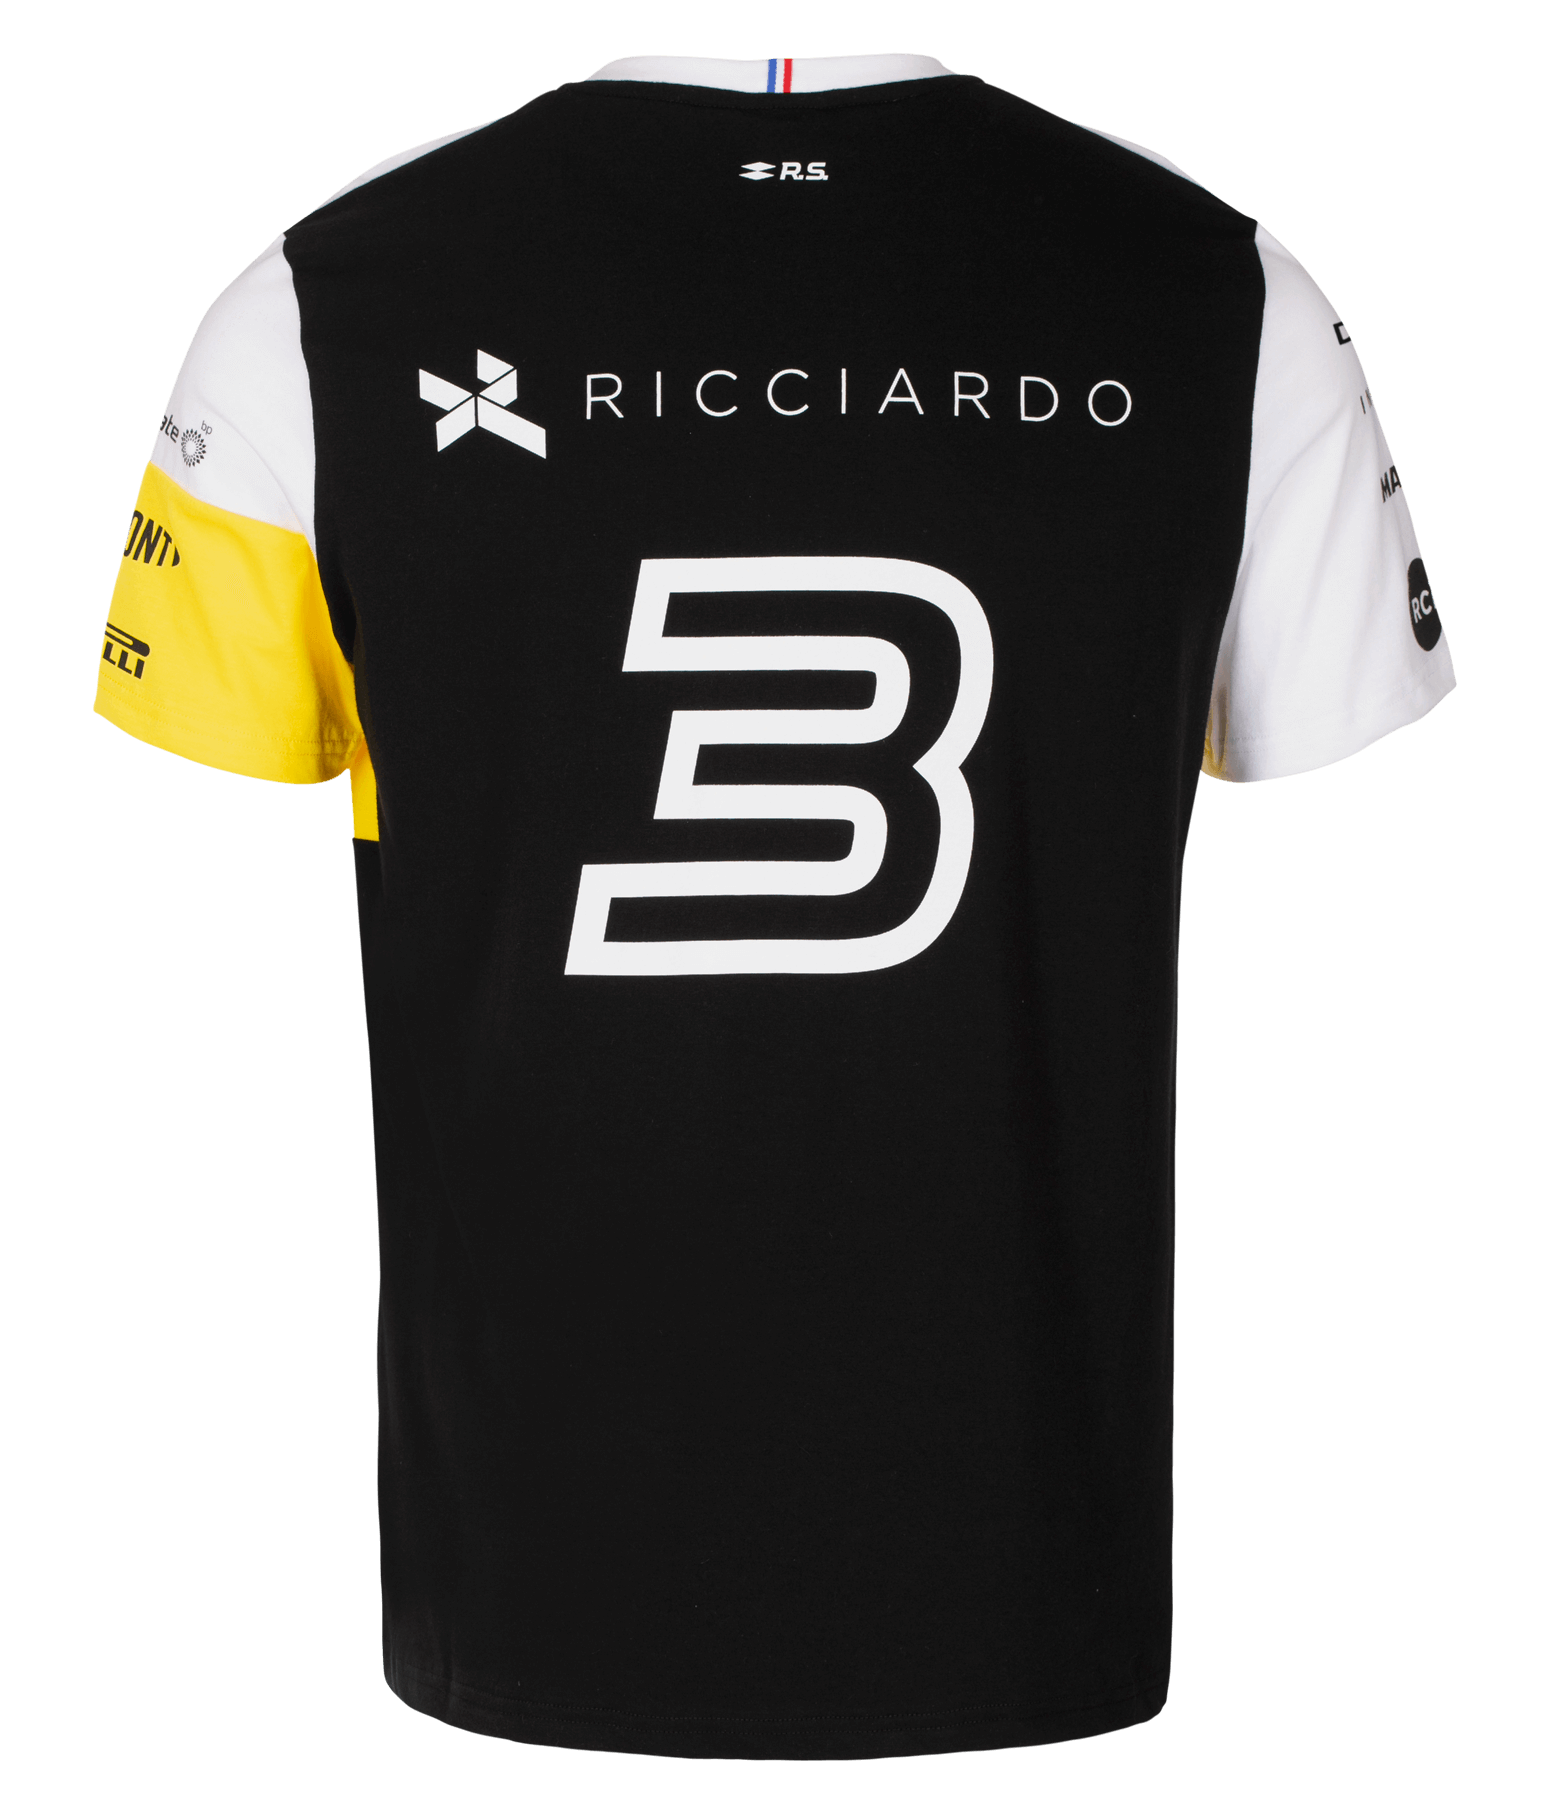 RENAULT DP WORLD F1® TEAM 2020 #3 Ricciardo kid's t-shirt